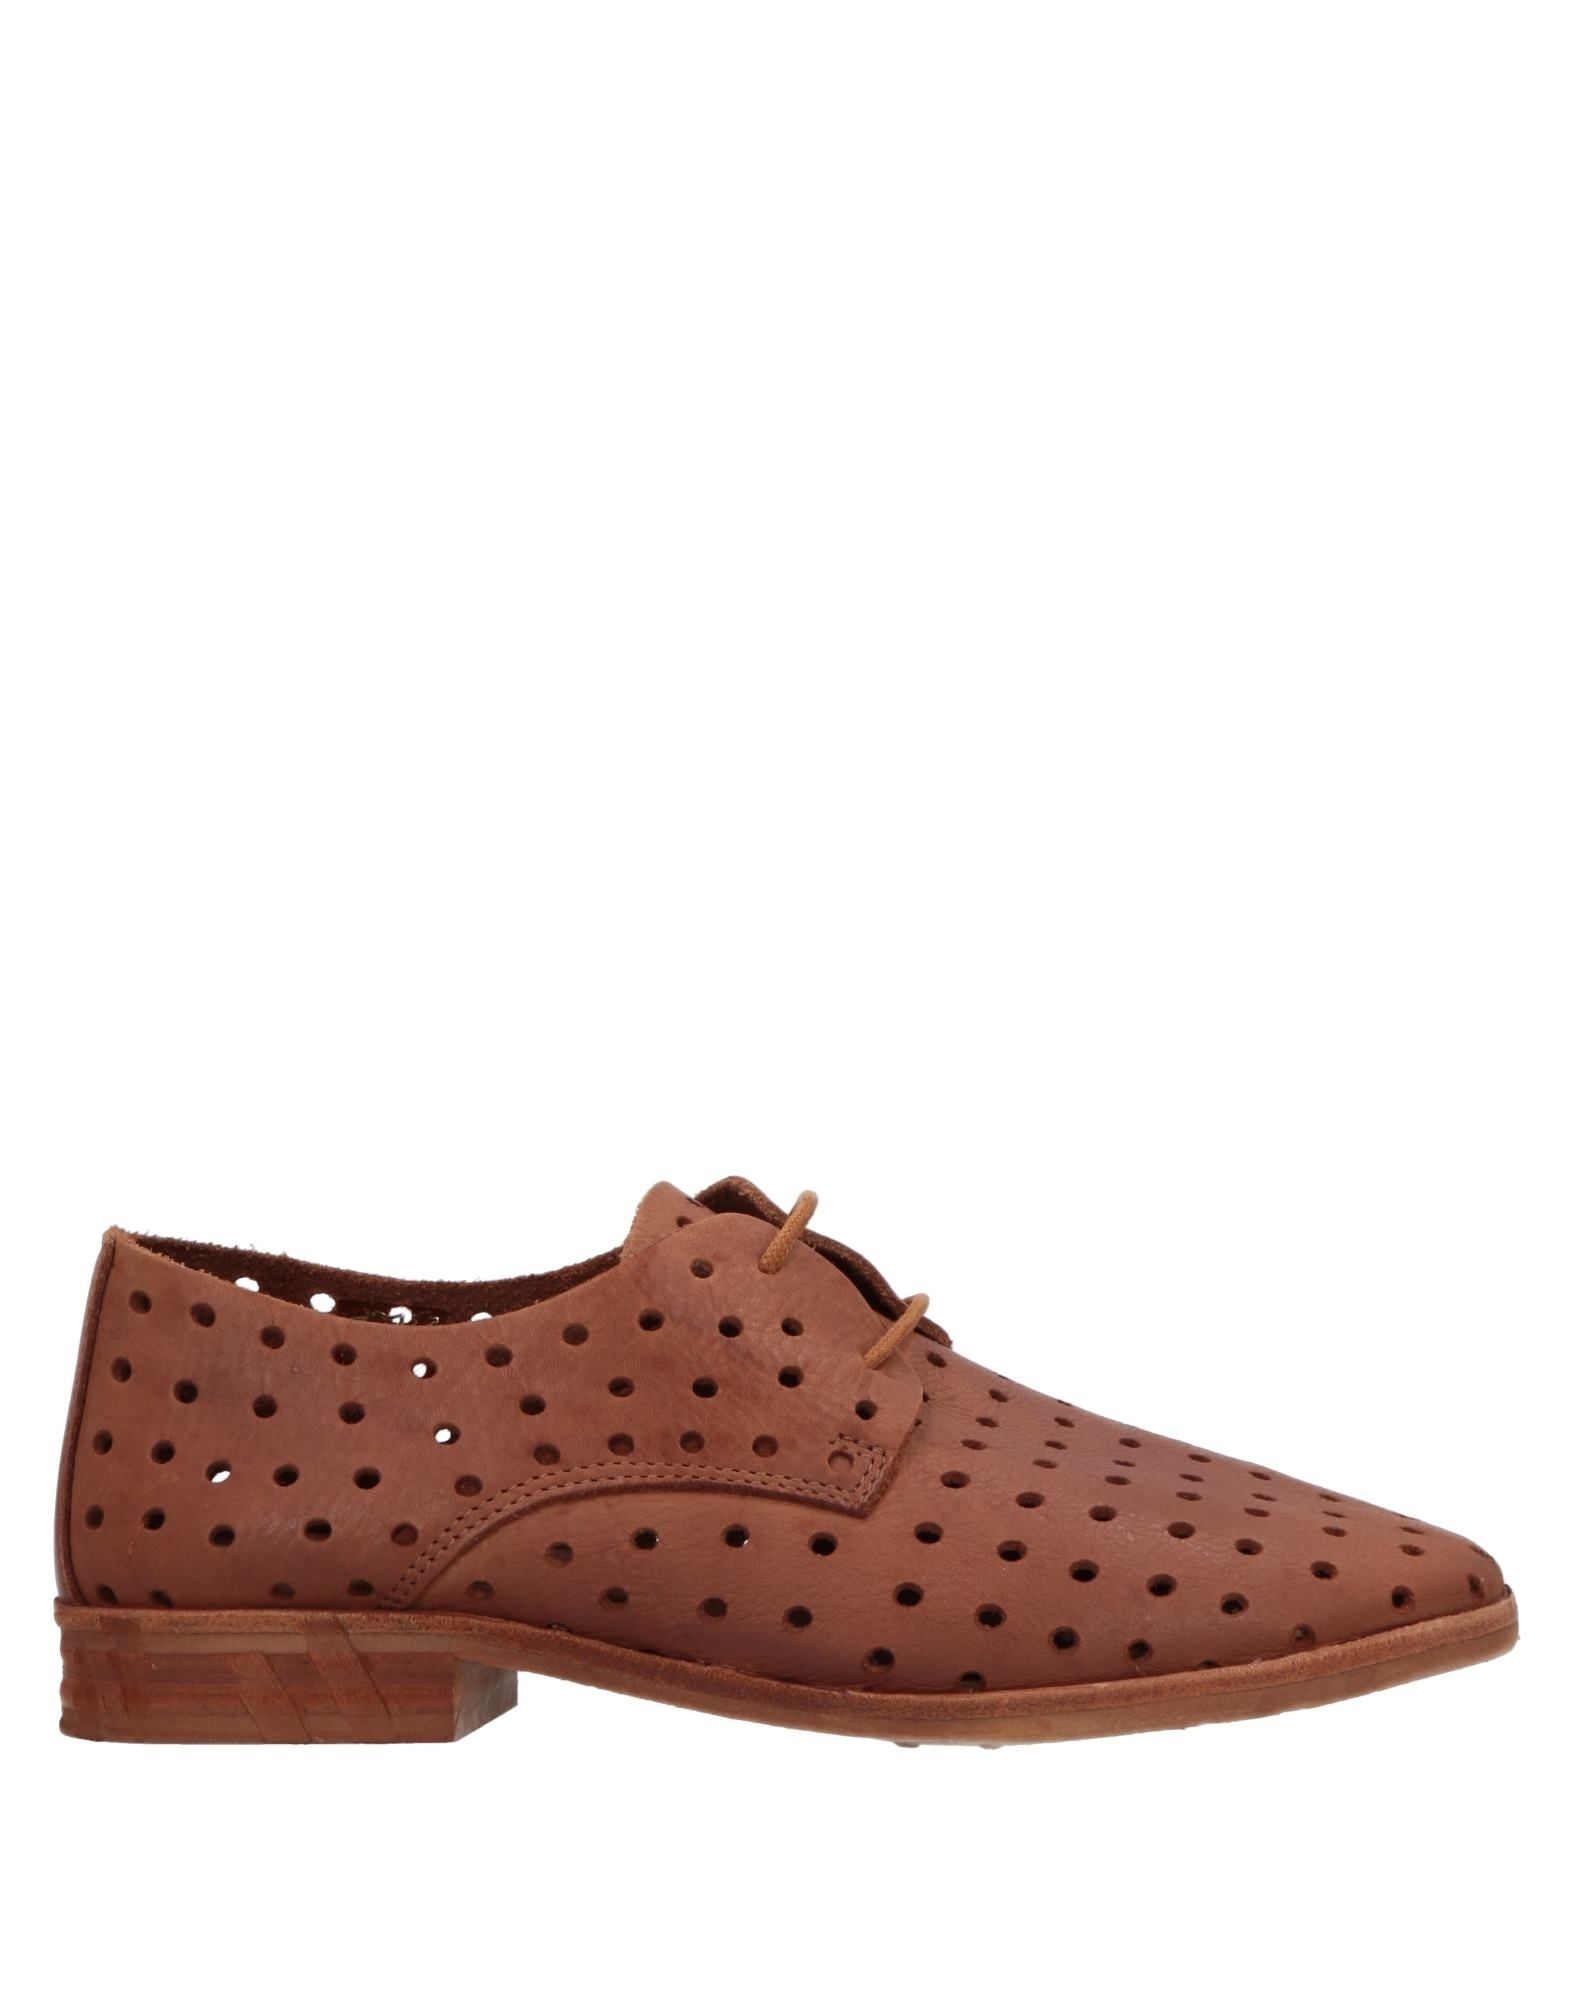 Фото - FELMINI Обувь на шнурках обувь на высокой платформе dkny